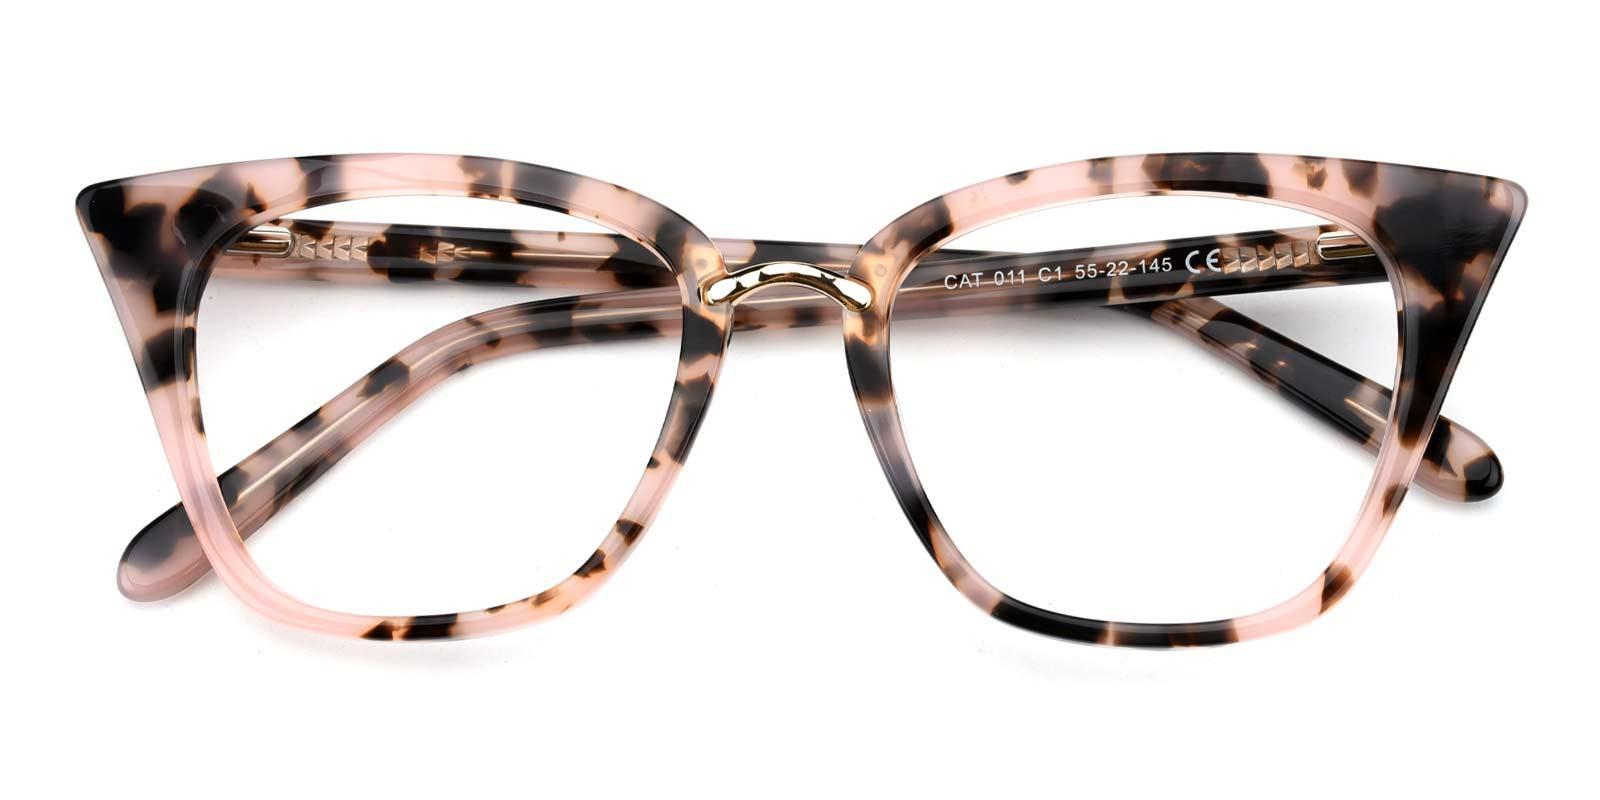 Jasmine-Pattern-Cat-Acetate-Eyeglasses-detail